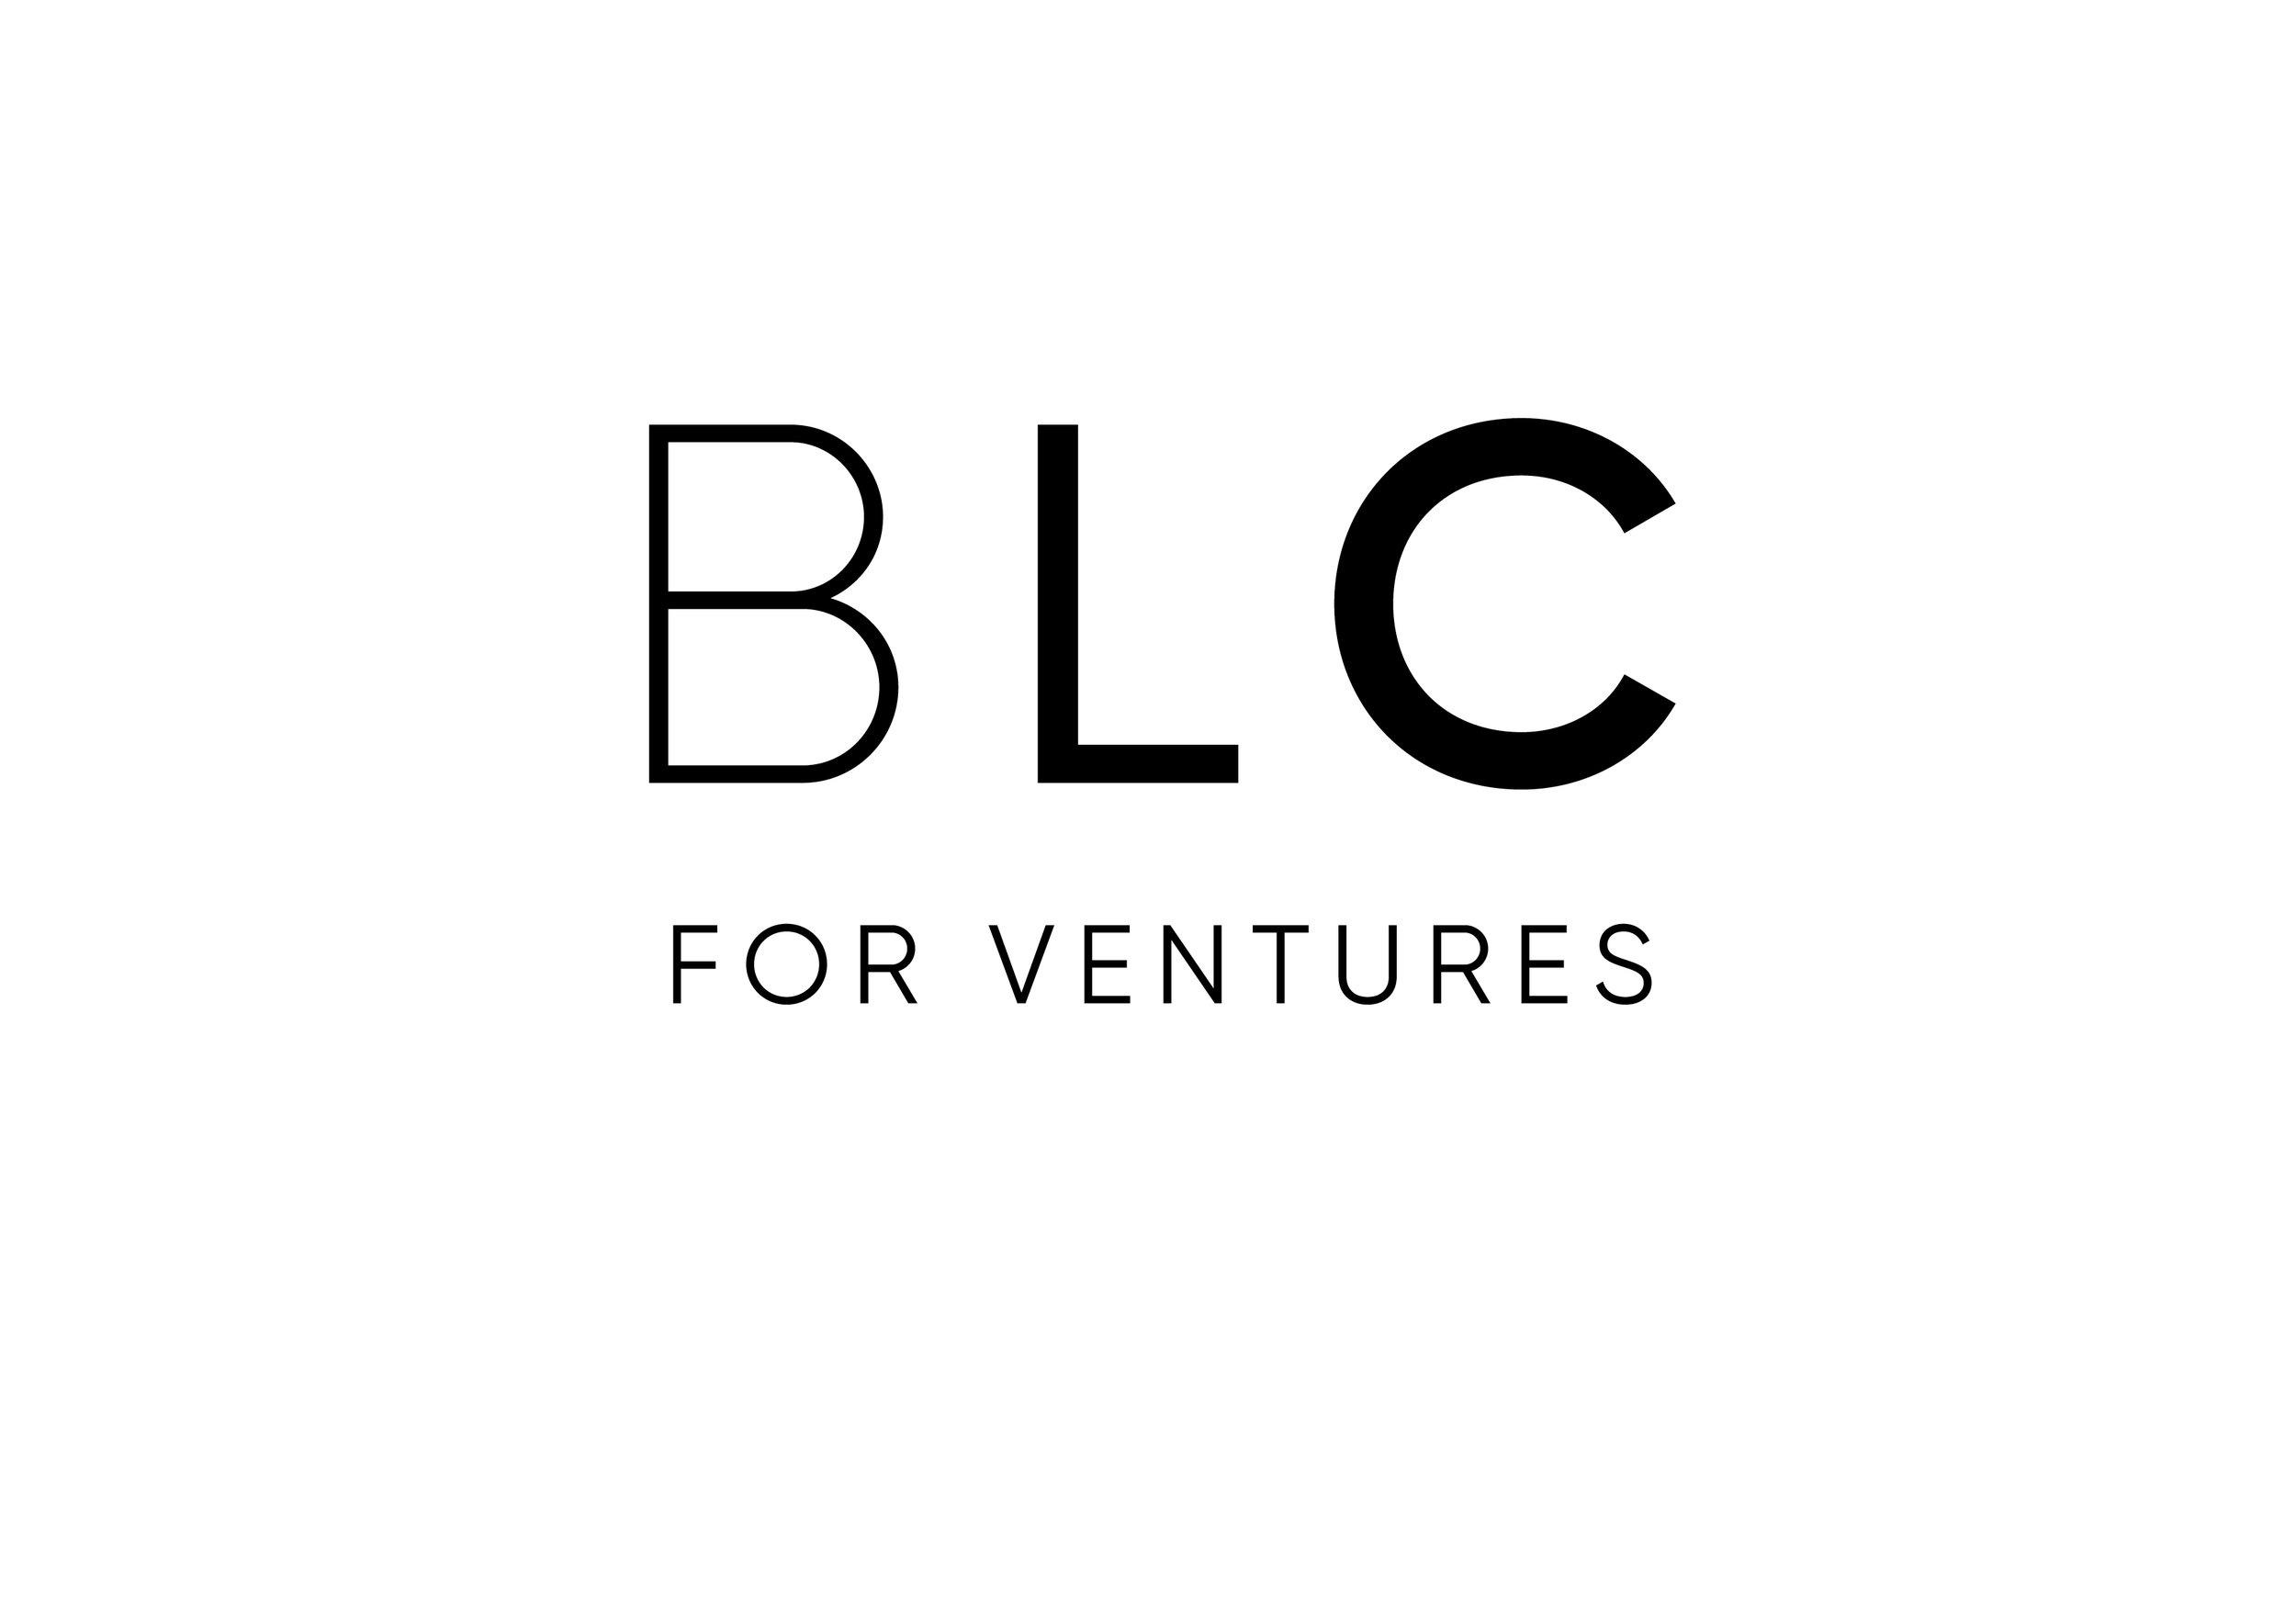 BLC_Ventures_Logo_01.jpg